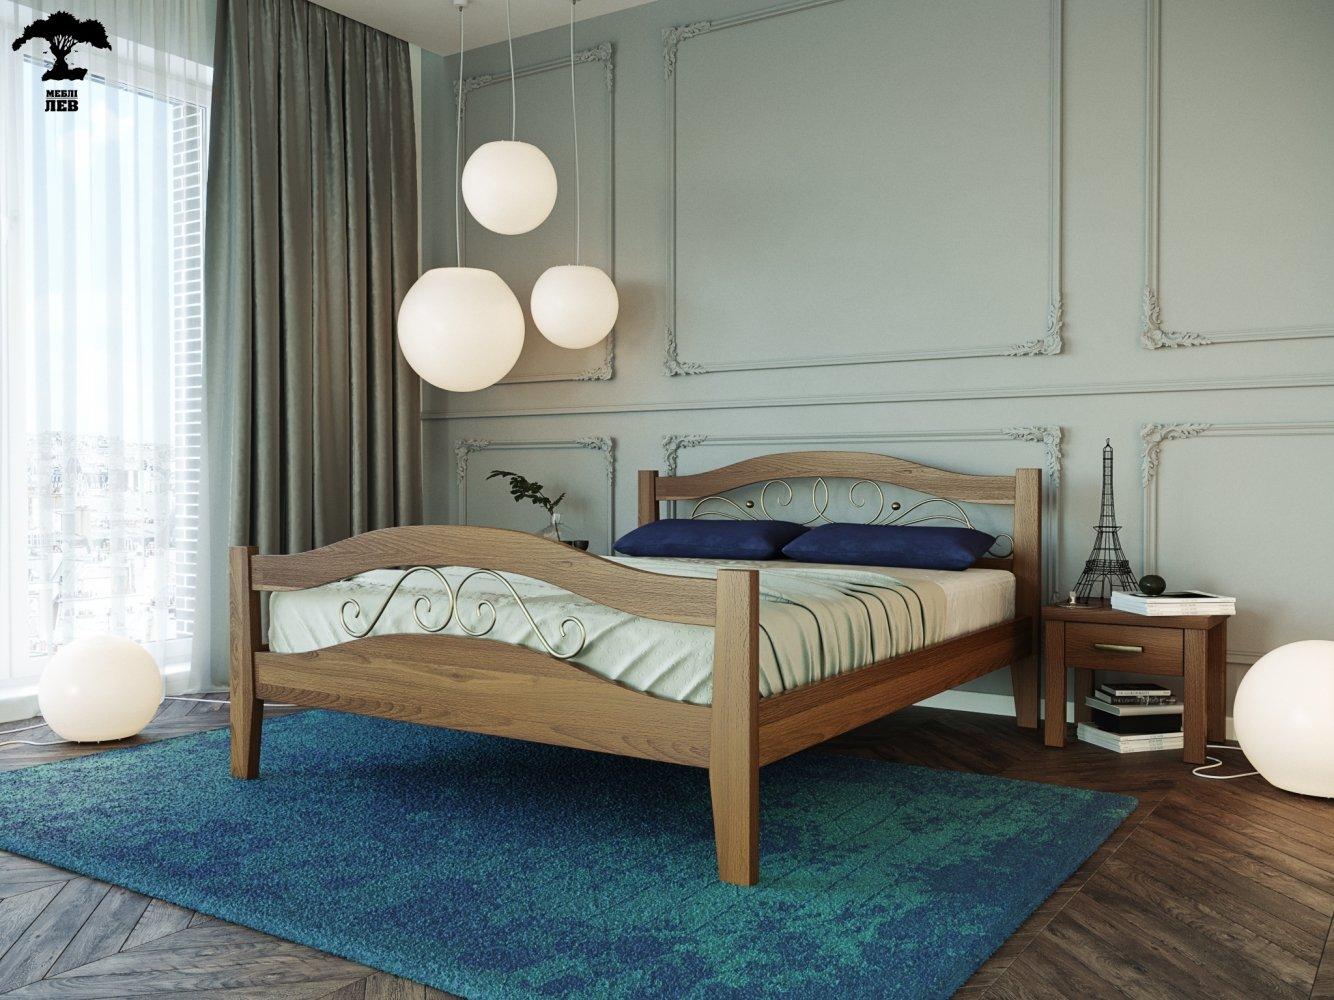 Ліжко Афіна-2 Лев 2